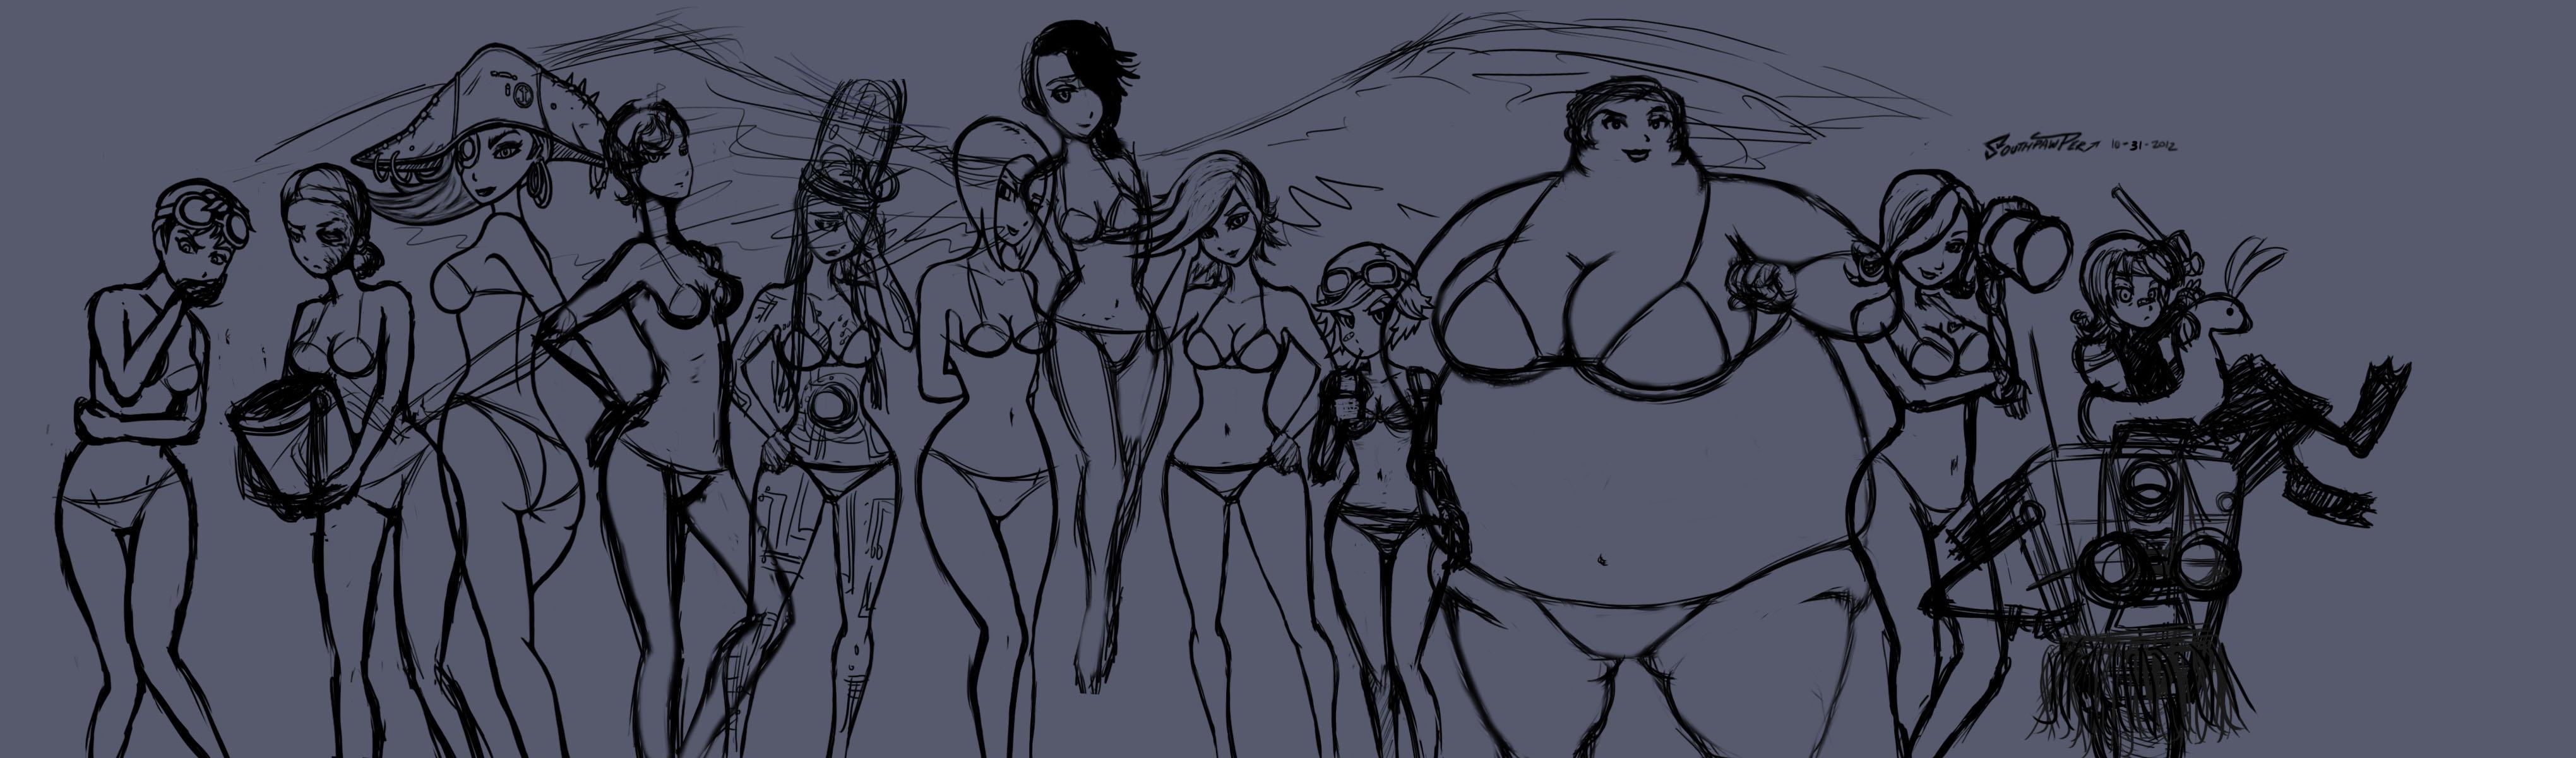 ... WIP-3-Borderlands Bikini Bundle by southpawper